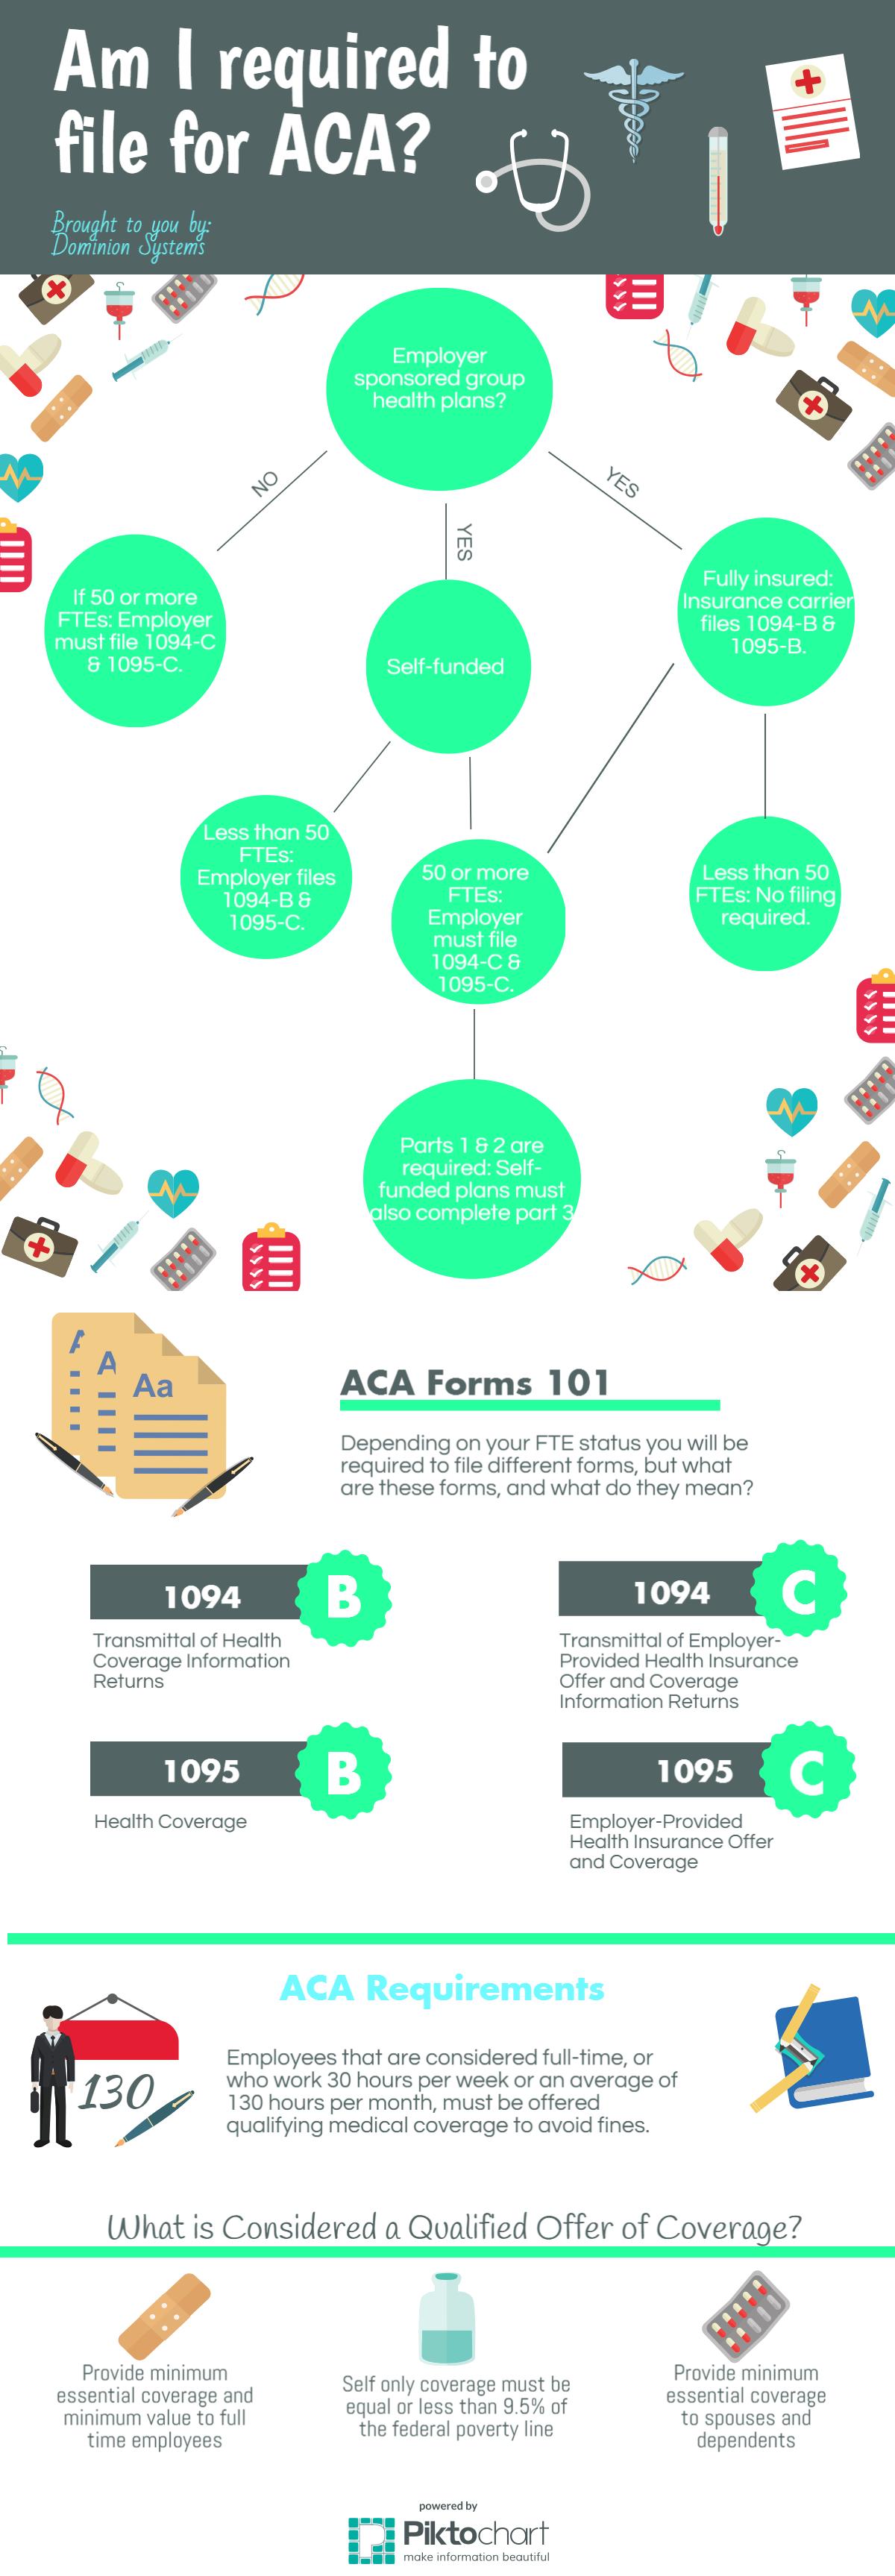 ACA AffordableCareAct Reporting HealthCare